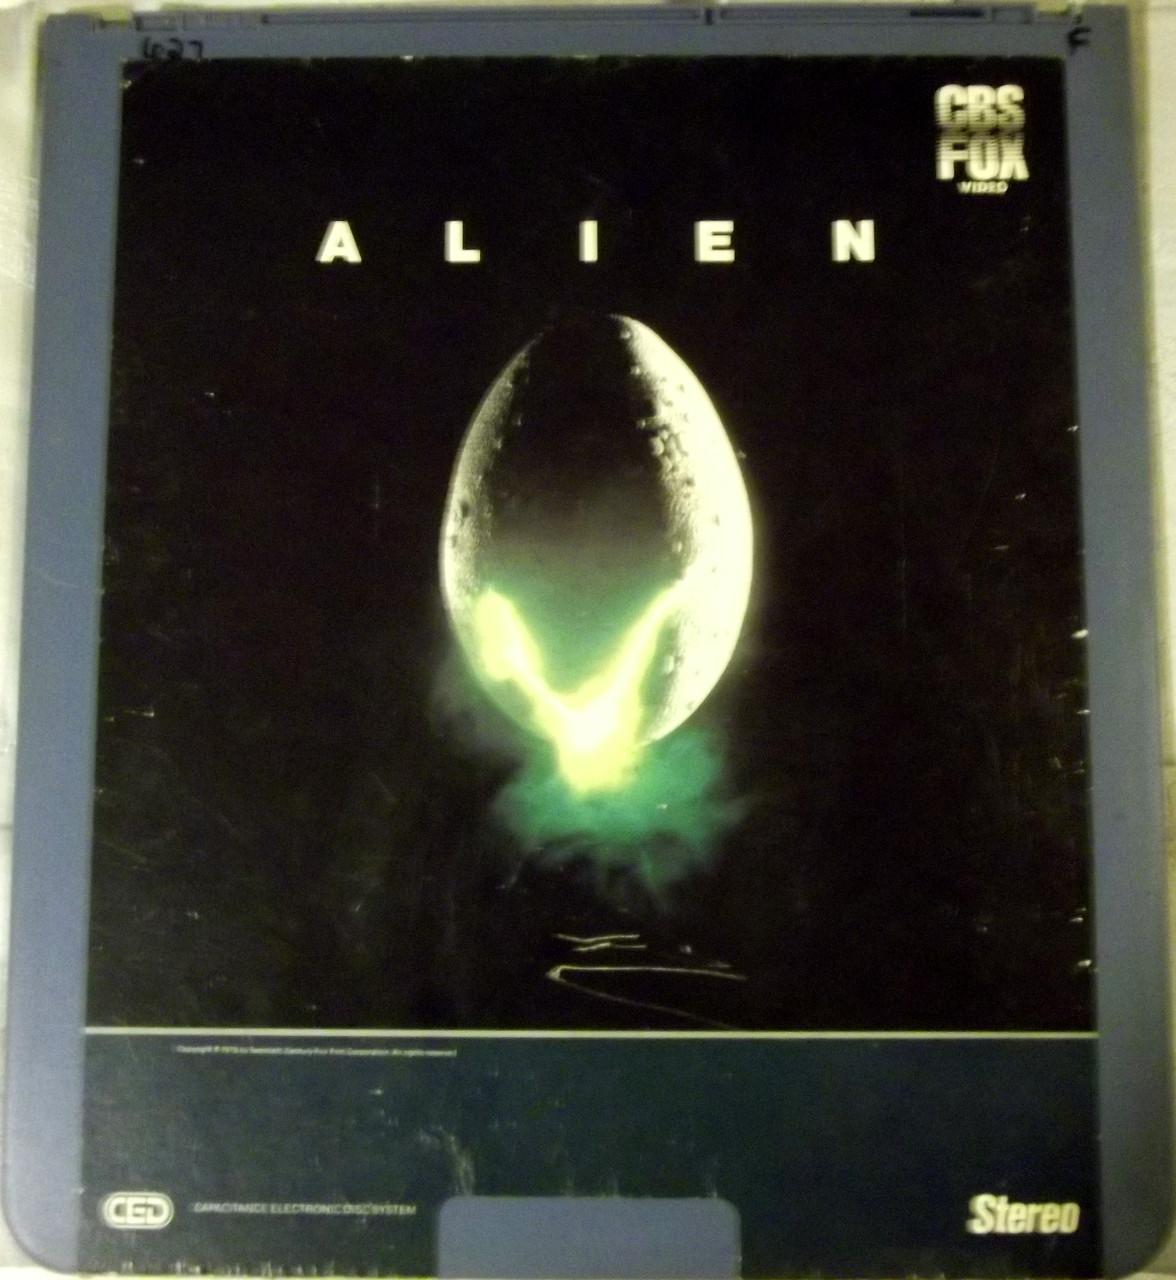 Alien CED: video on vinyl